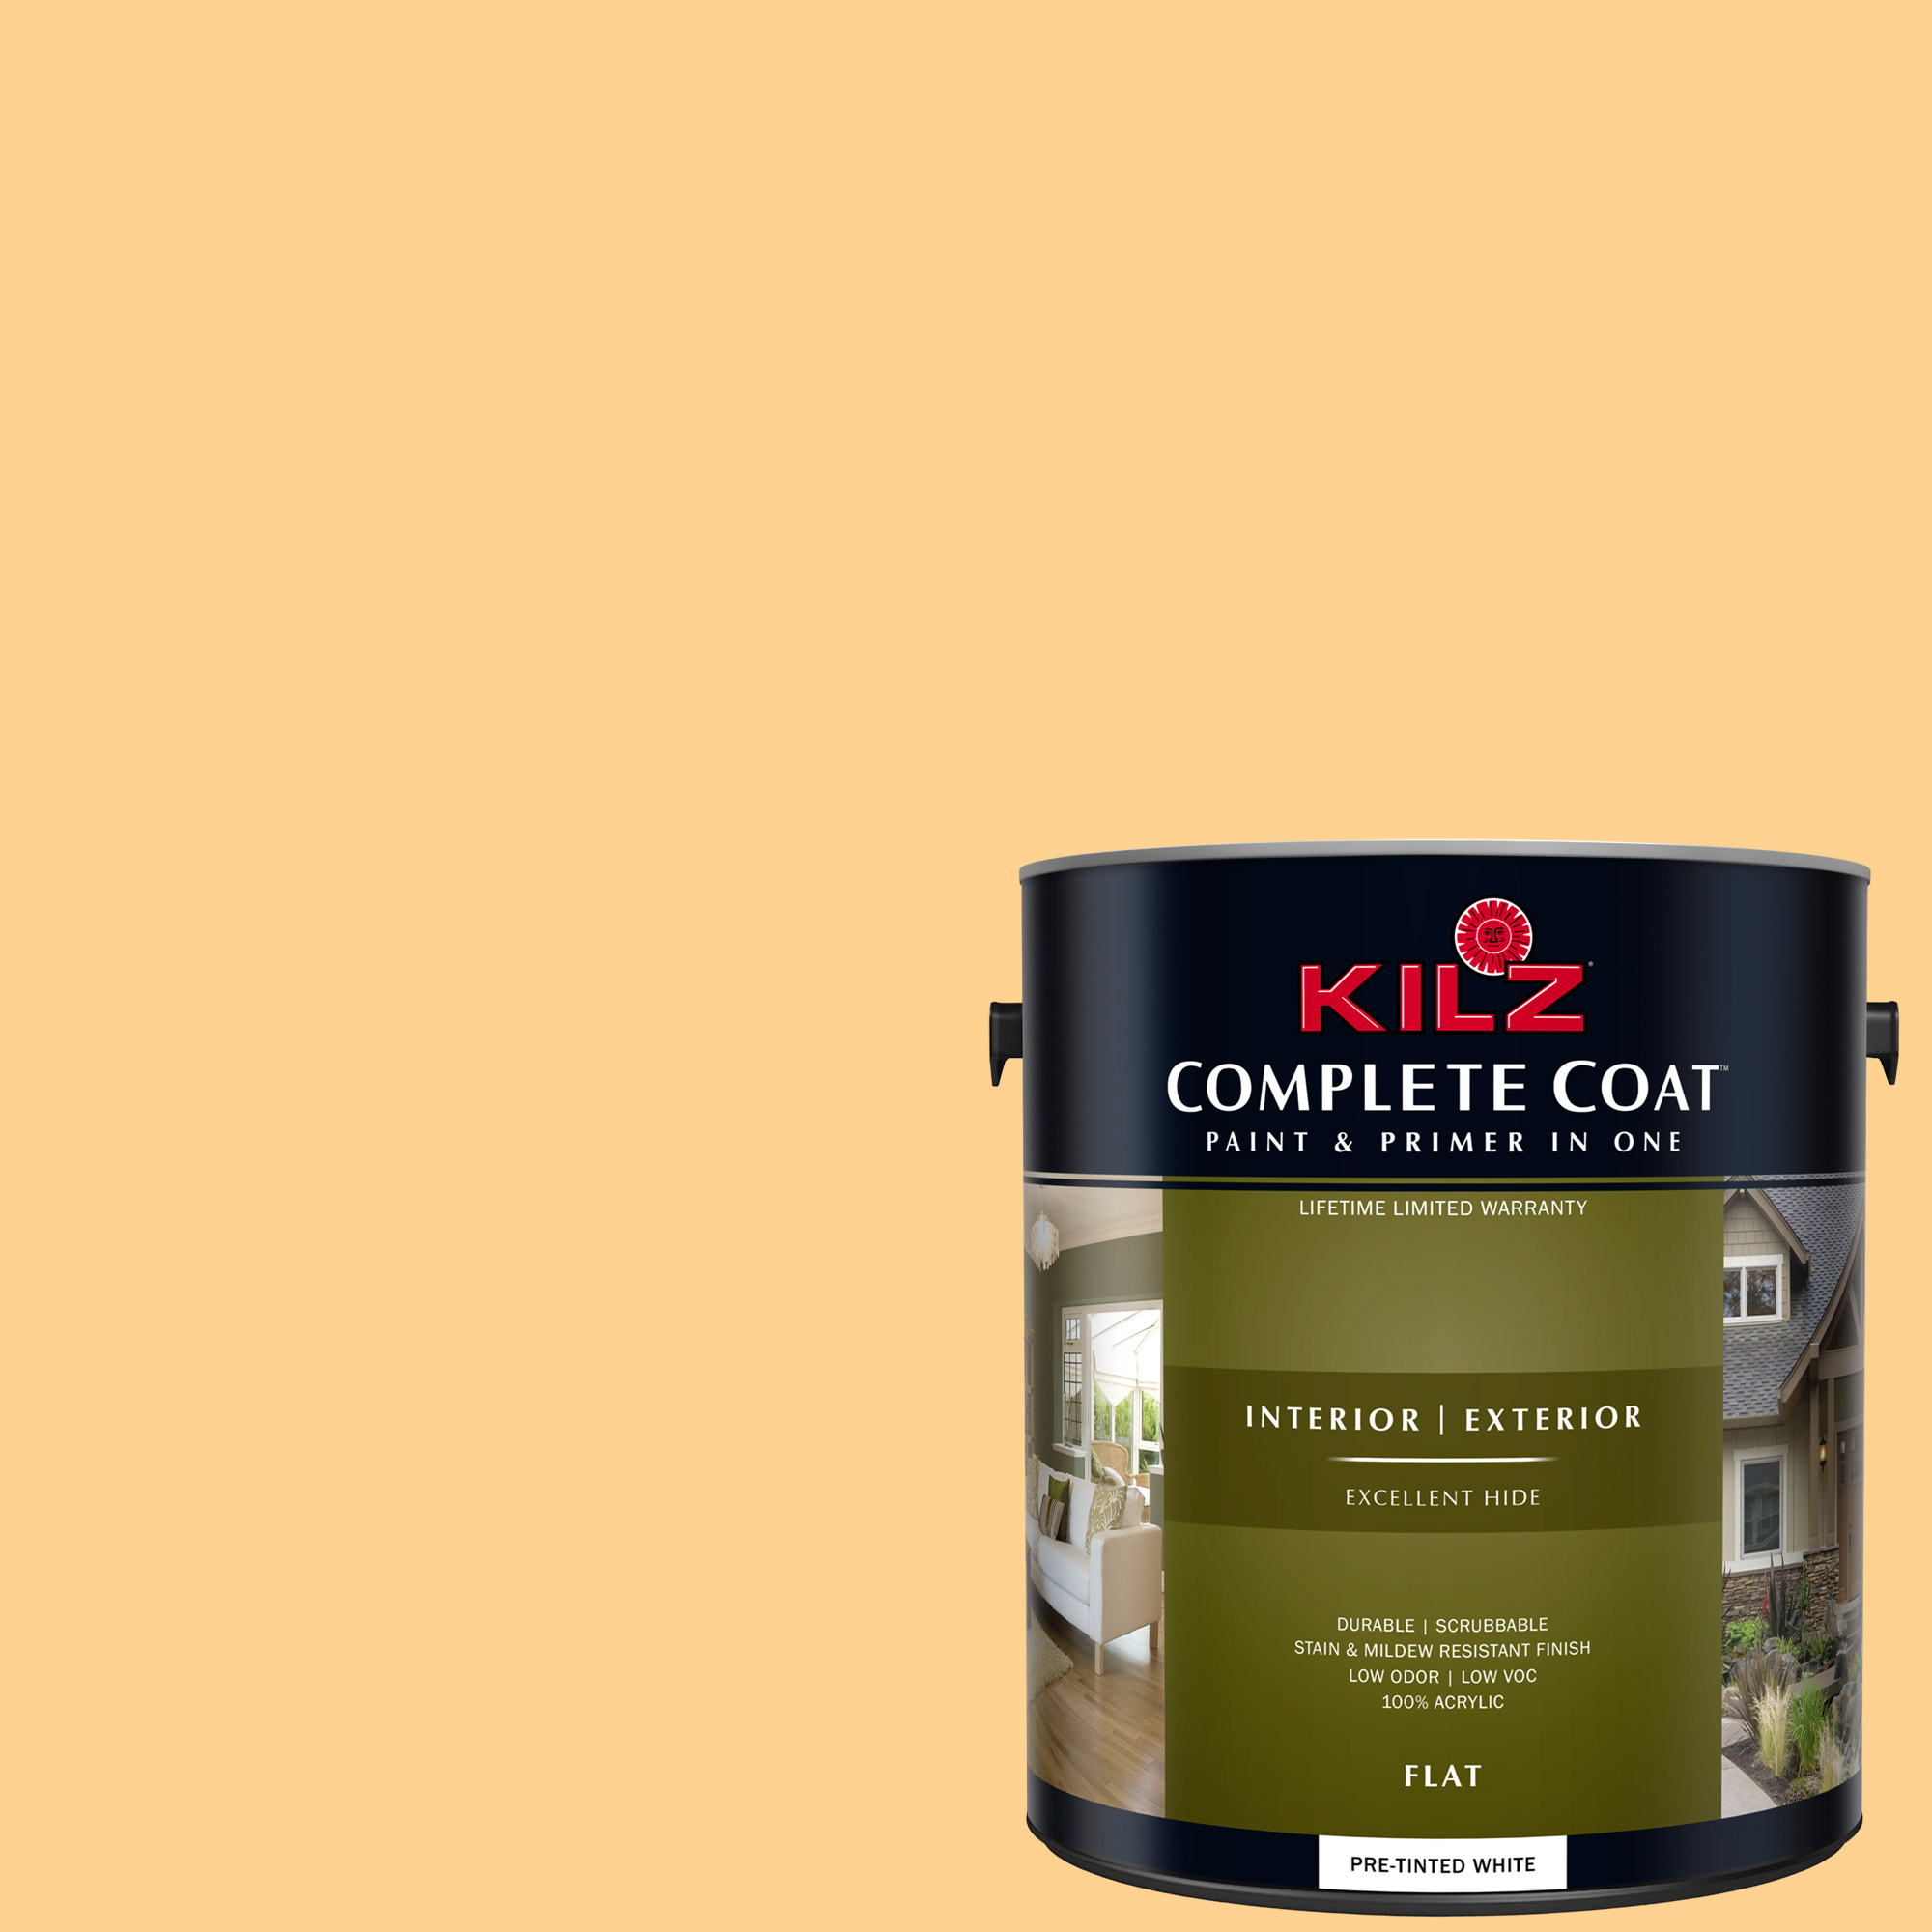 KILZ COMPLETE COAT Interior/Exterior Paint & Primer in One #LD250-01 Glaze Gold